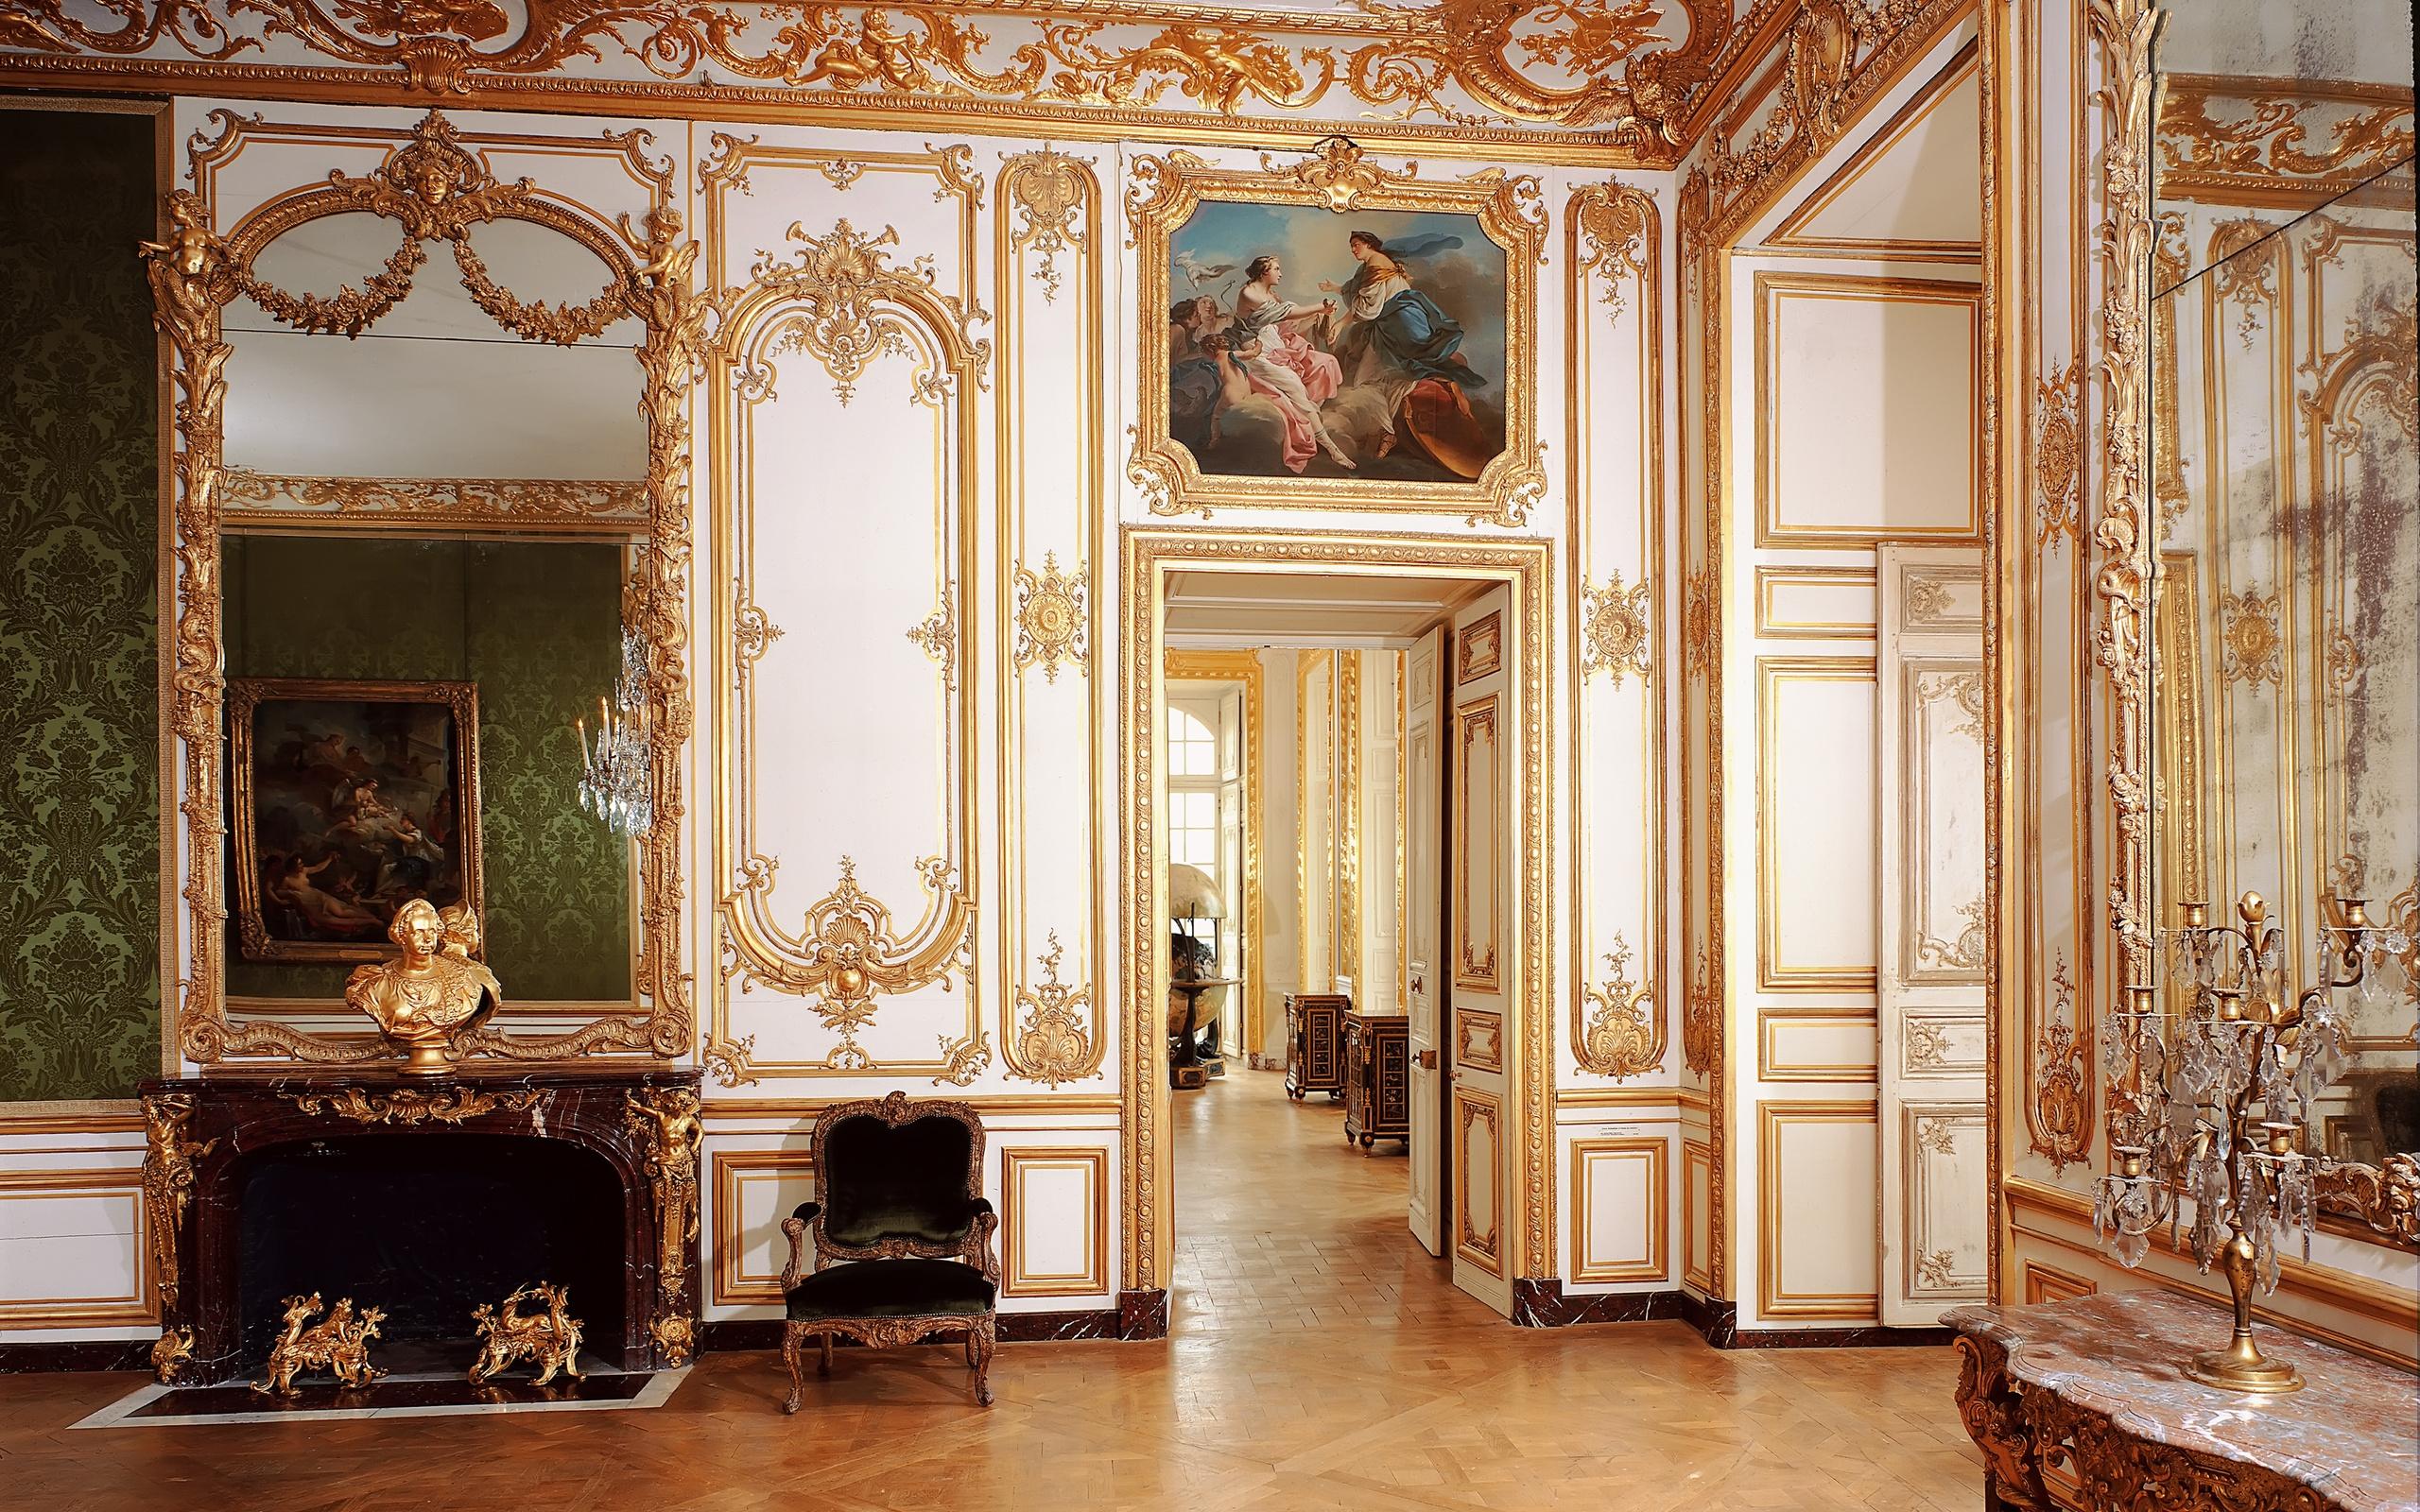 Wallpaper : building, wood, vintage, interior design, palace